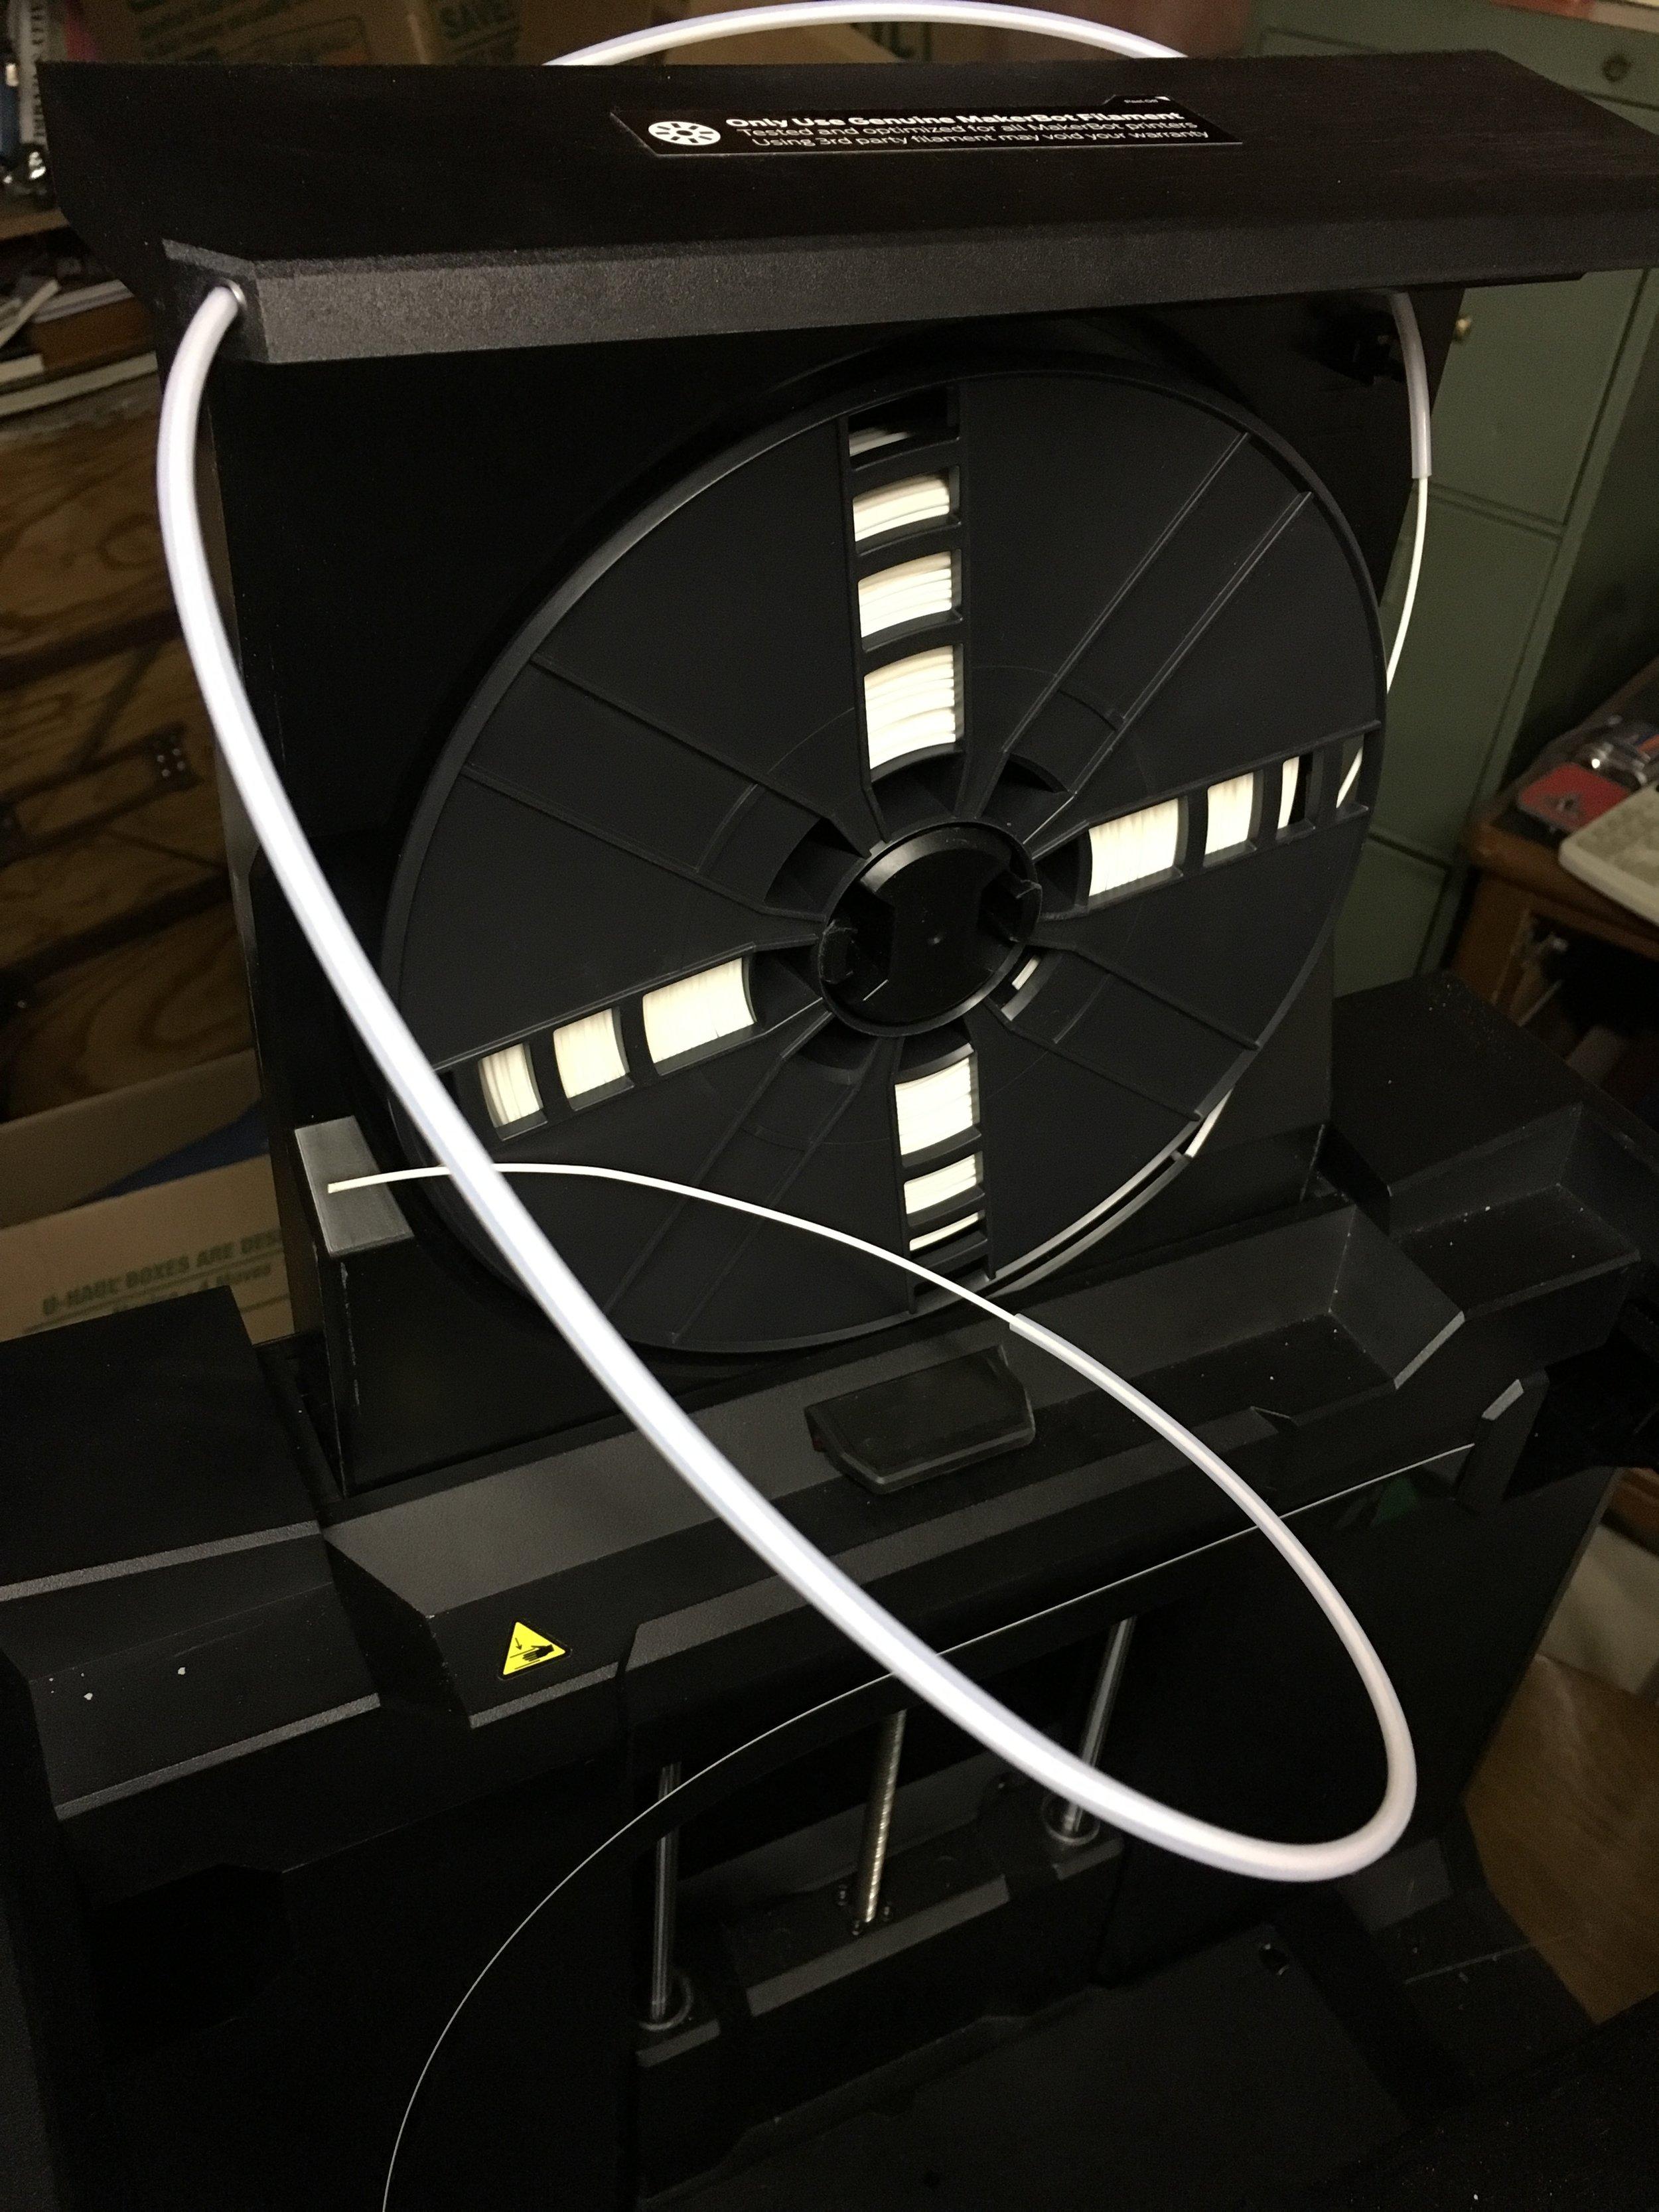 The sometimes-dangerous MakerBot Replicator+ vertical filament drawer